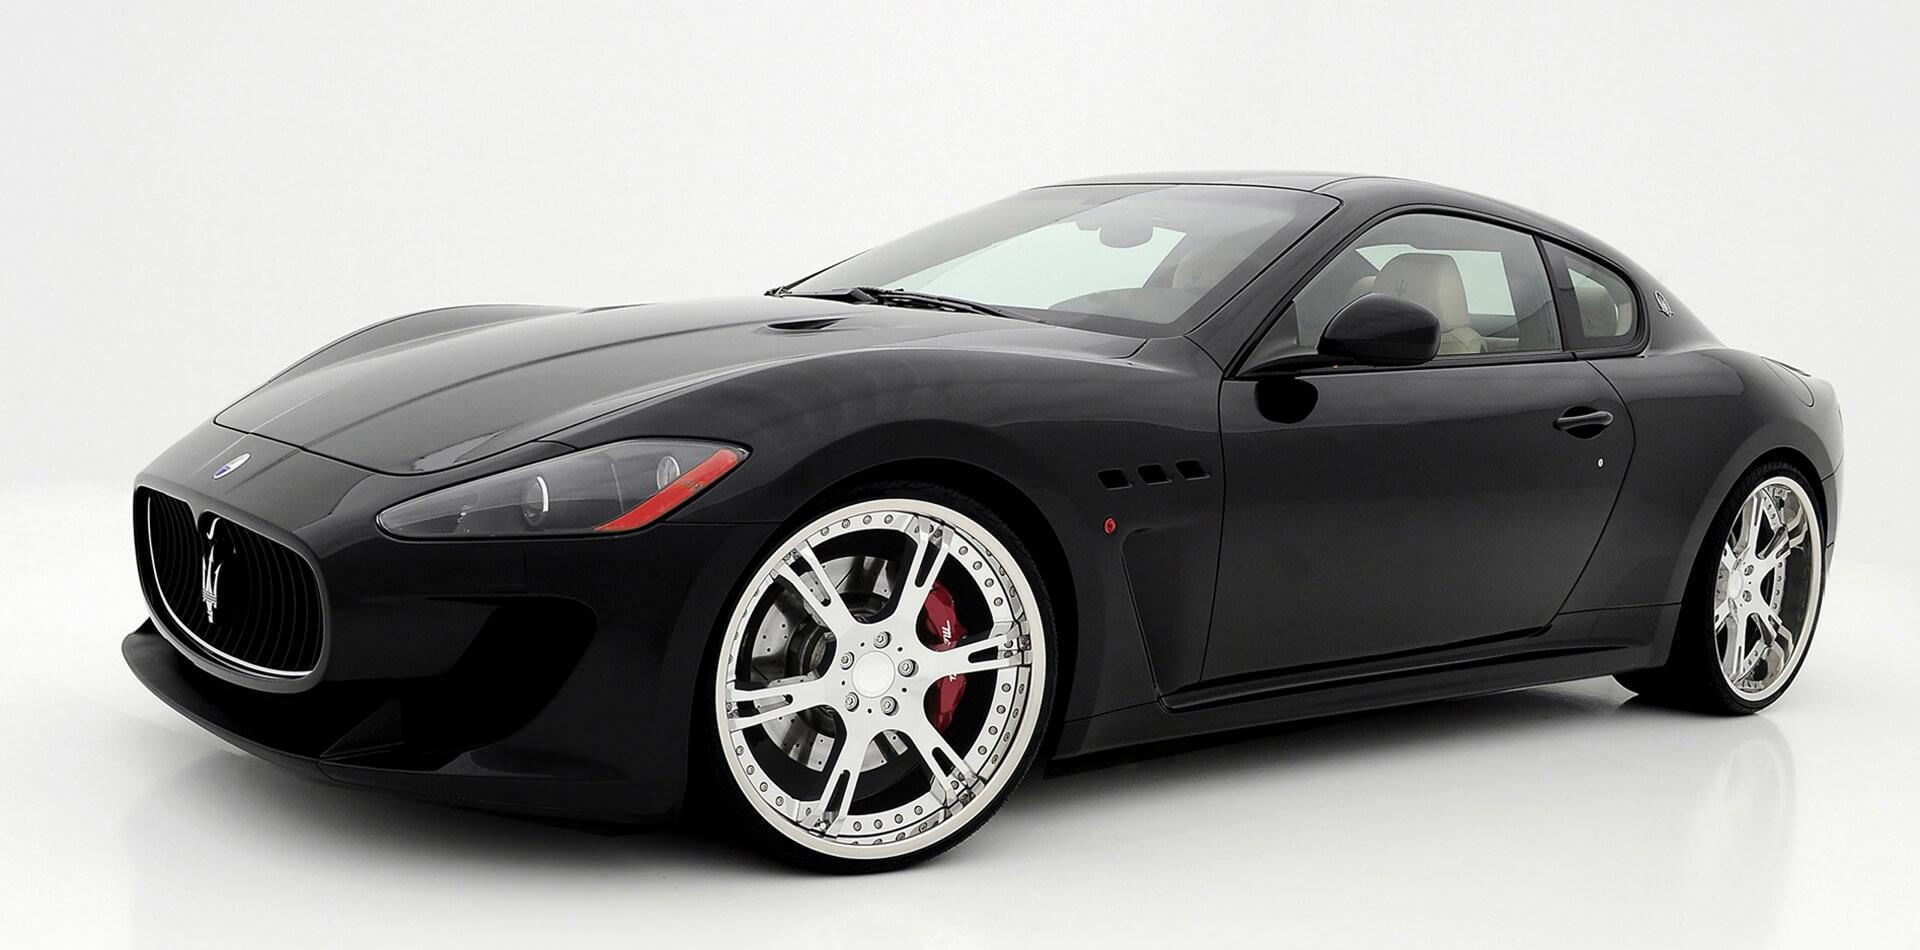 Maserati_Gran_Turismo_MC_Stradale_Felgen-1